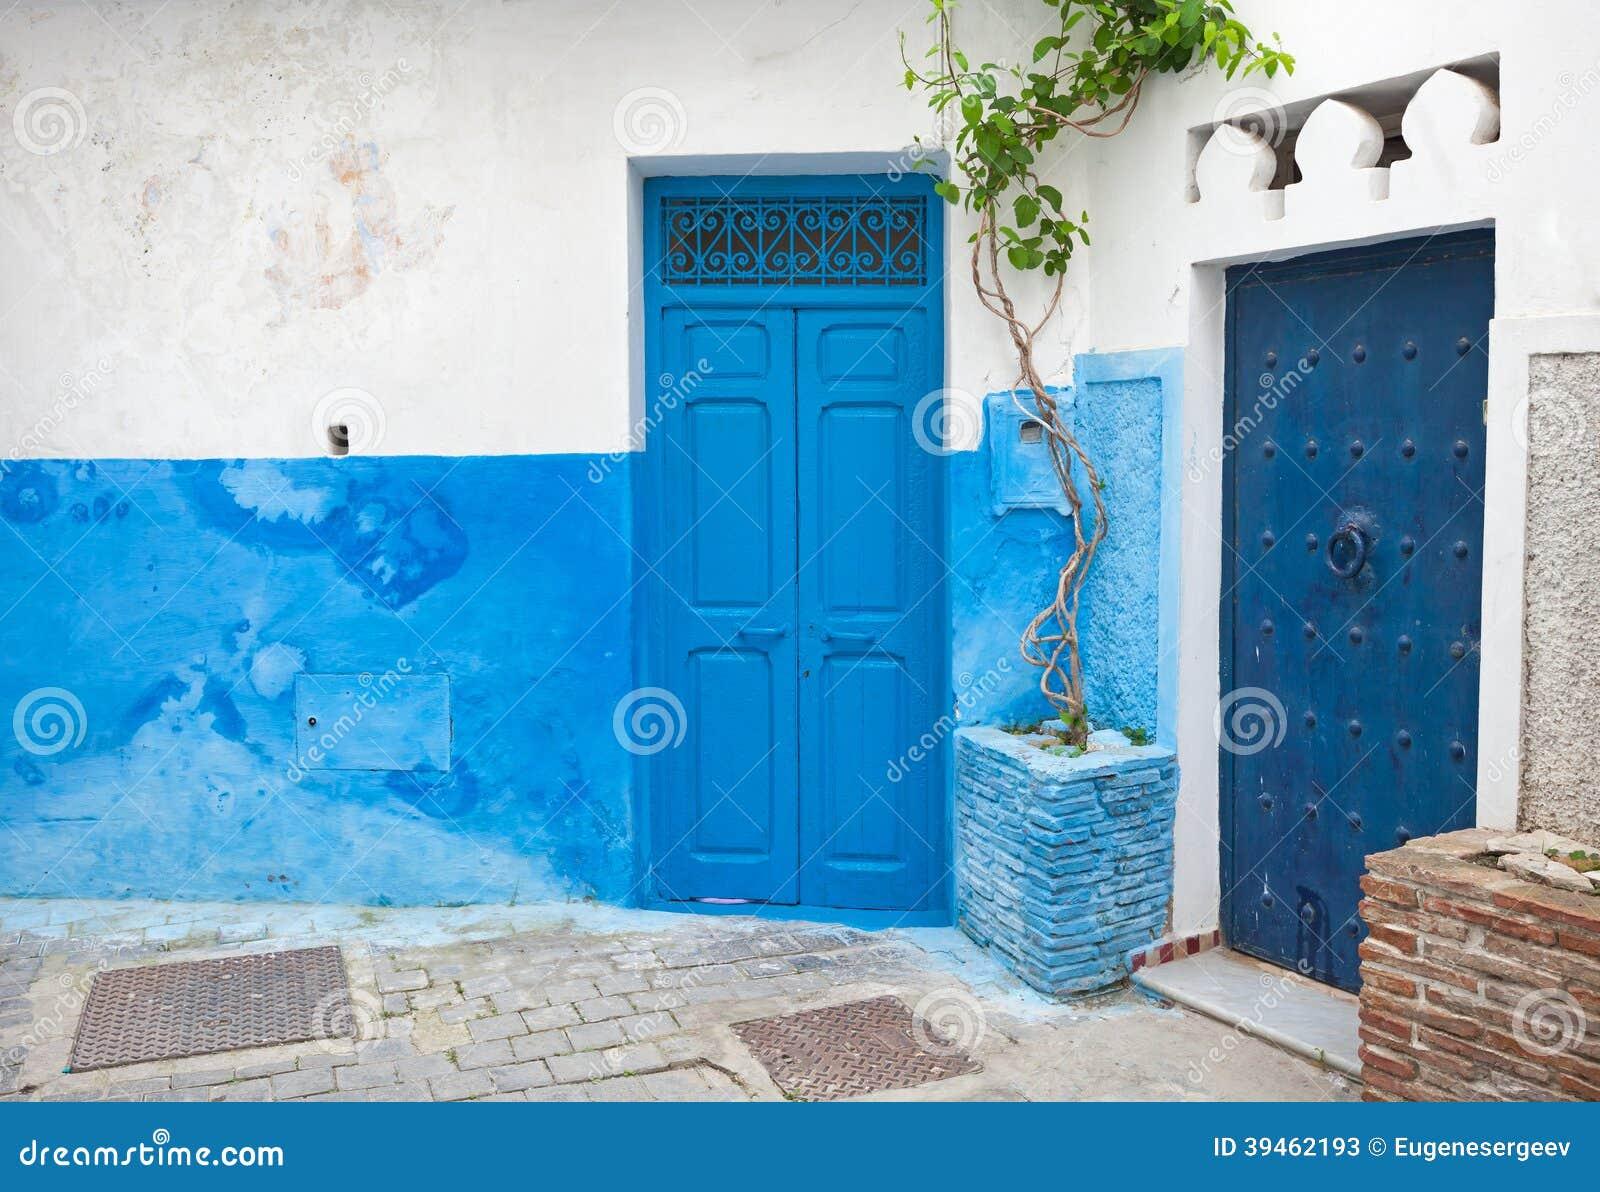 Puertas azules y paredes blancas t nger marruecos foto for Paredes grises y puertas blancas